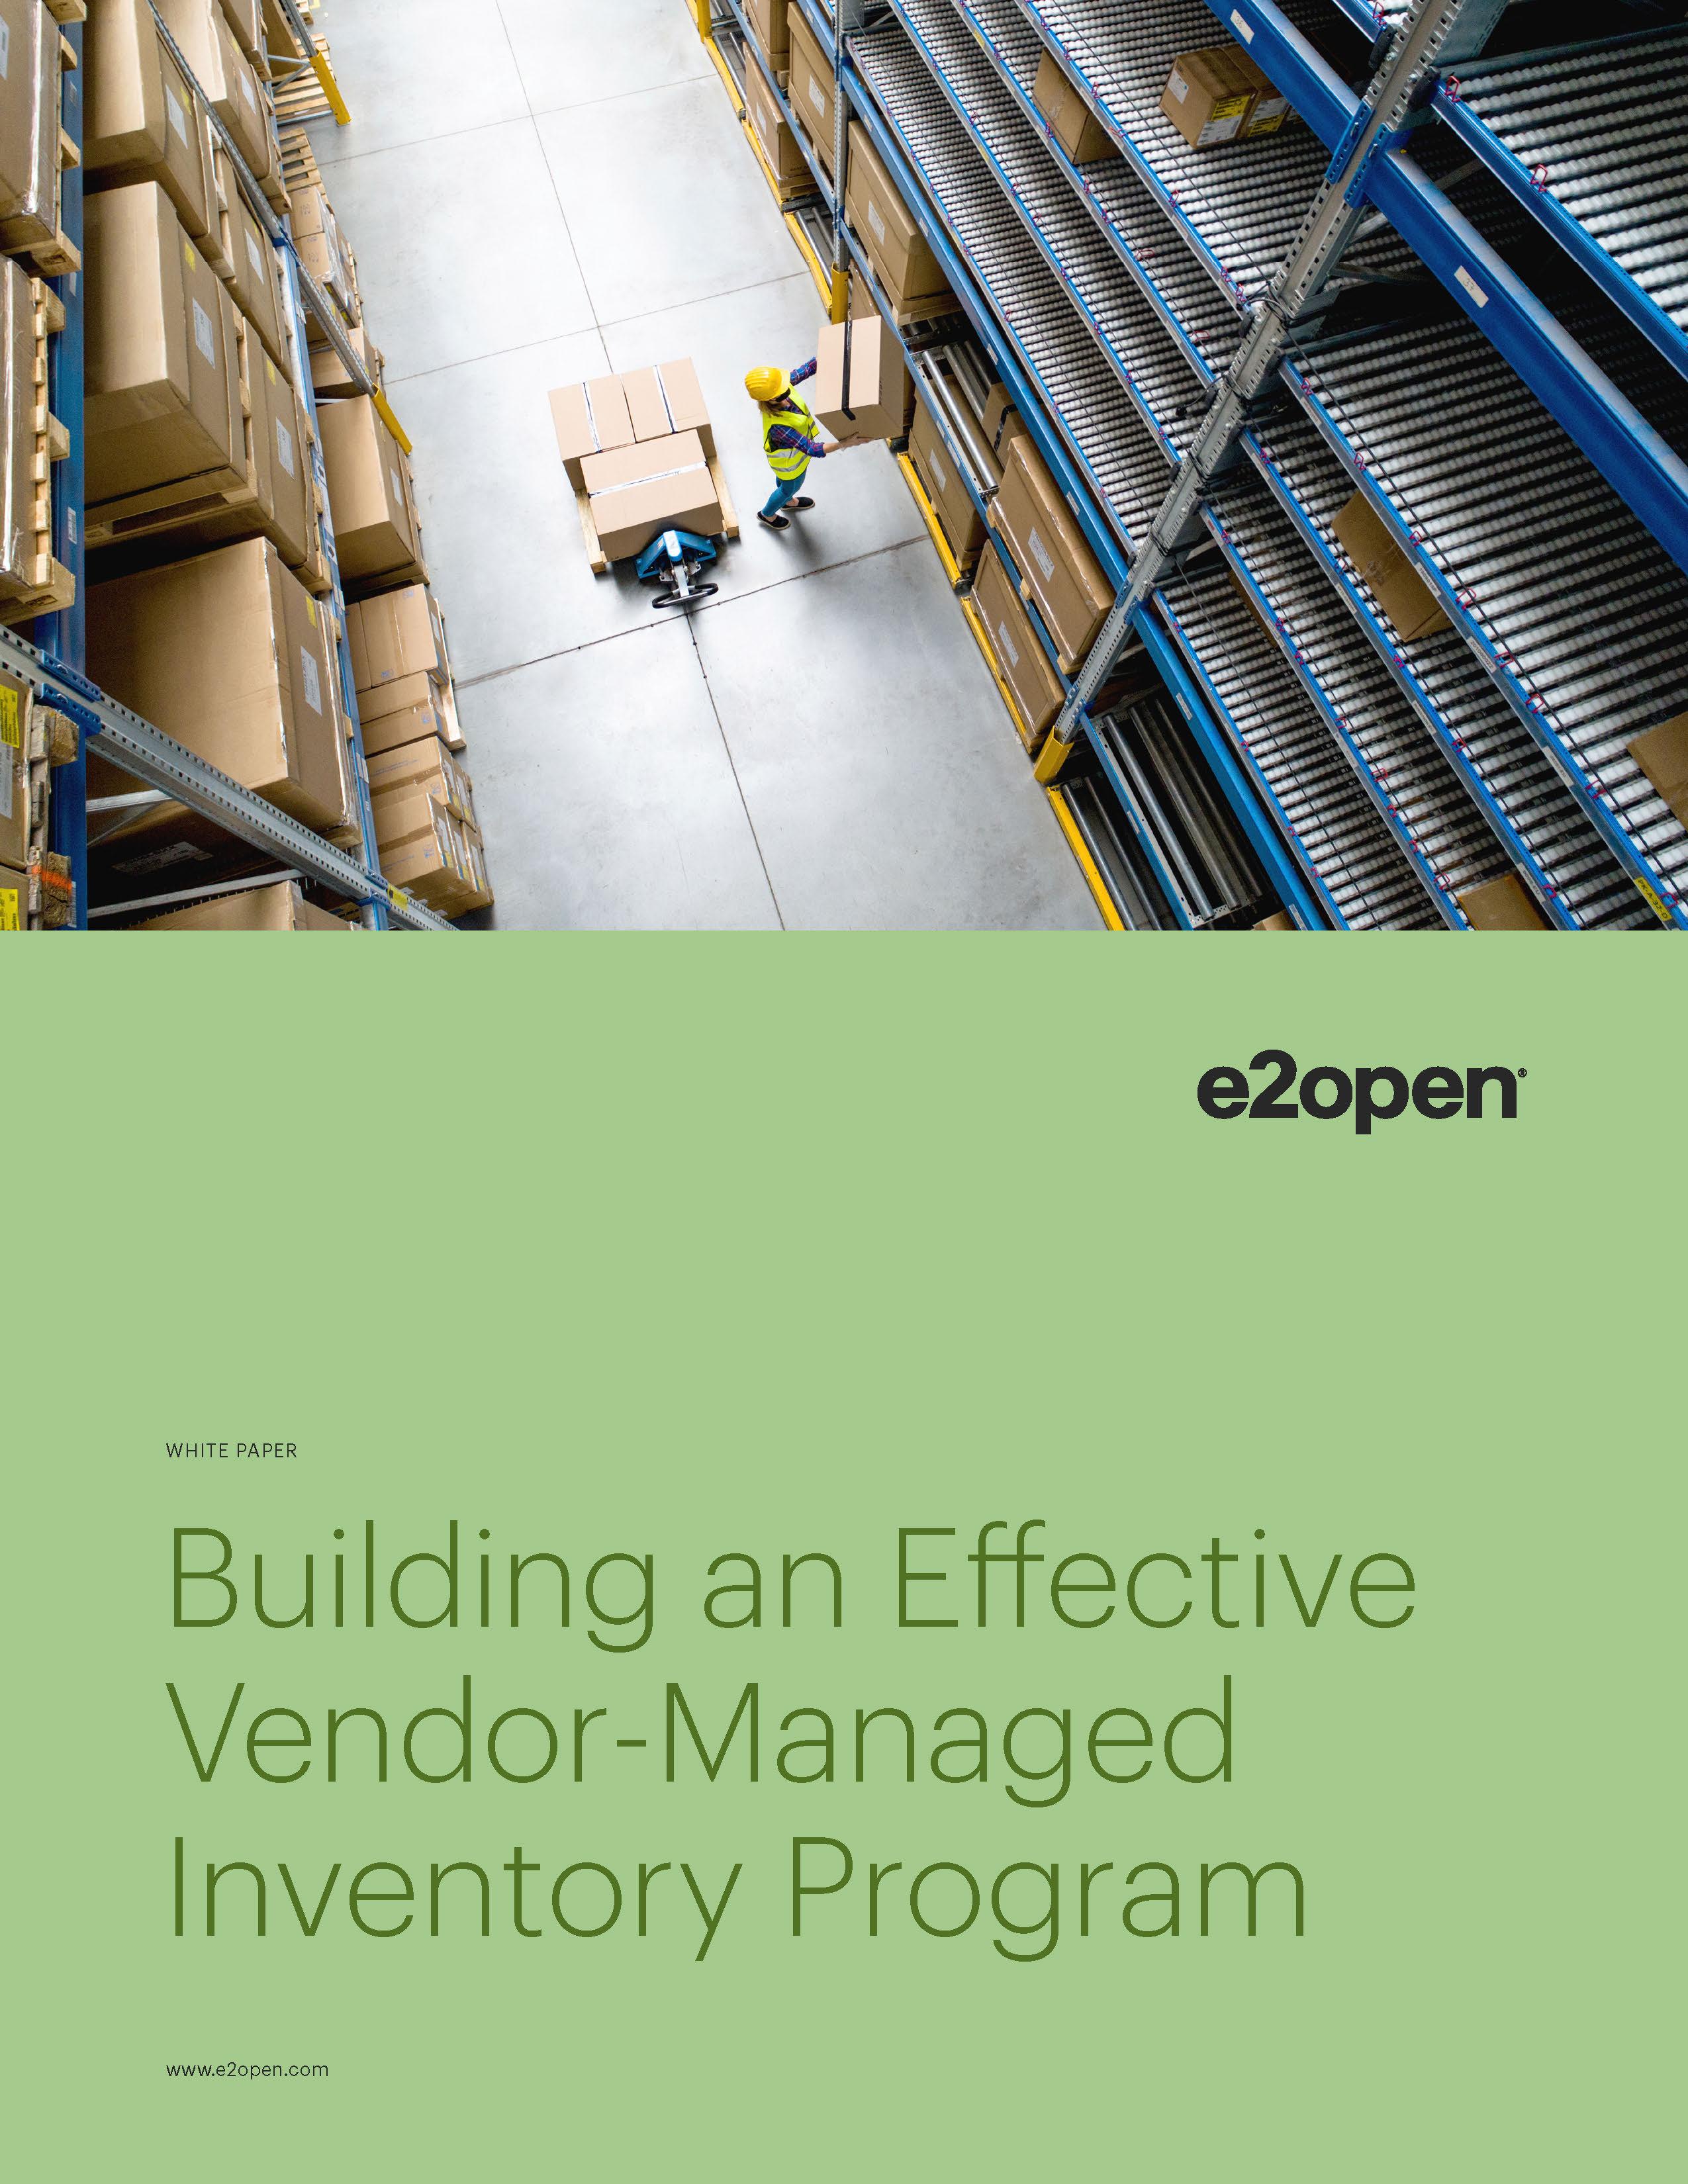 Building an Effective Vendor-Managed Inventory Program